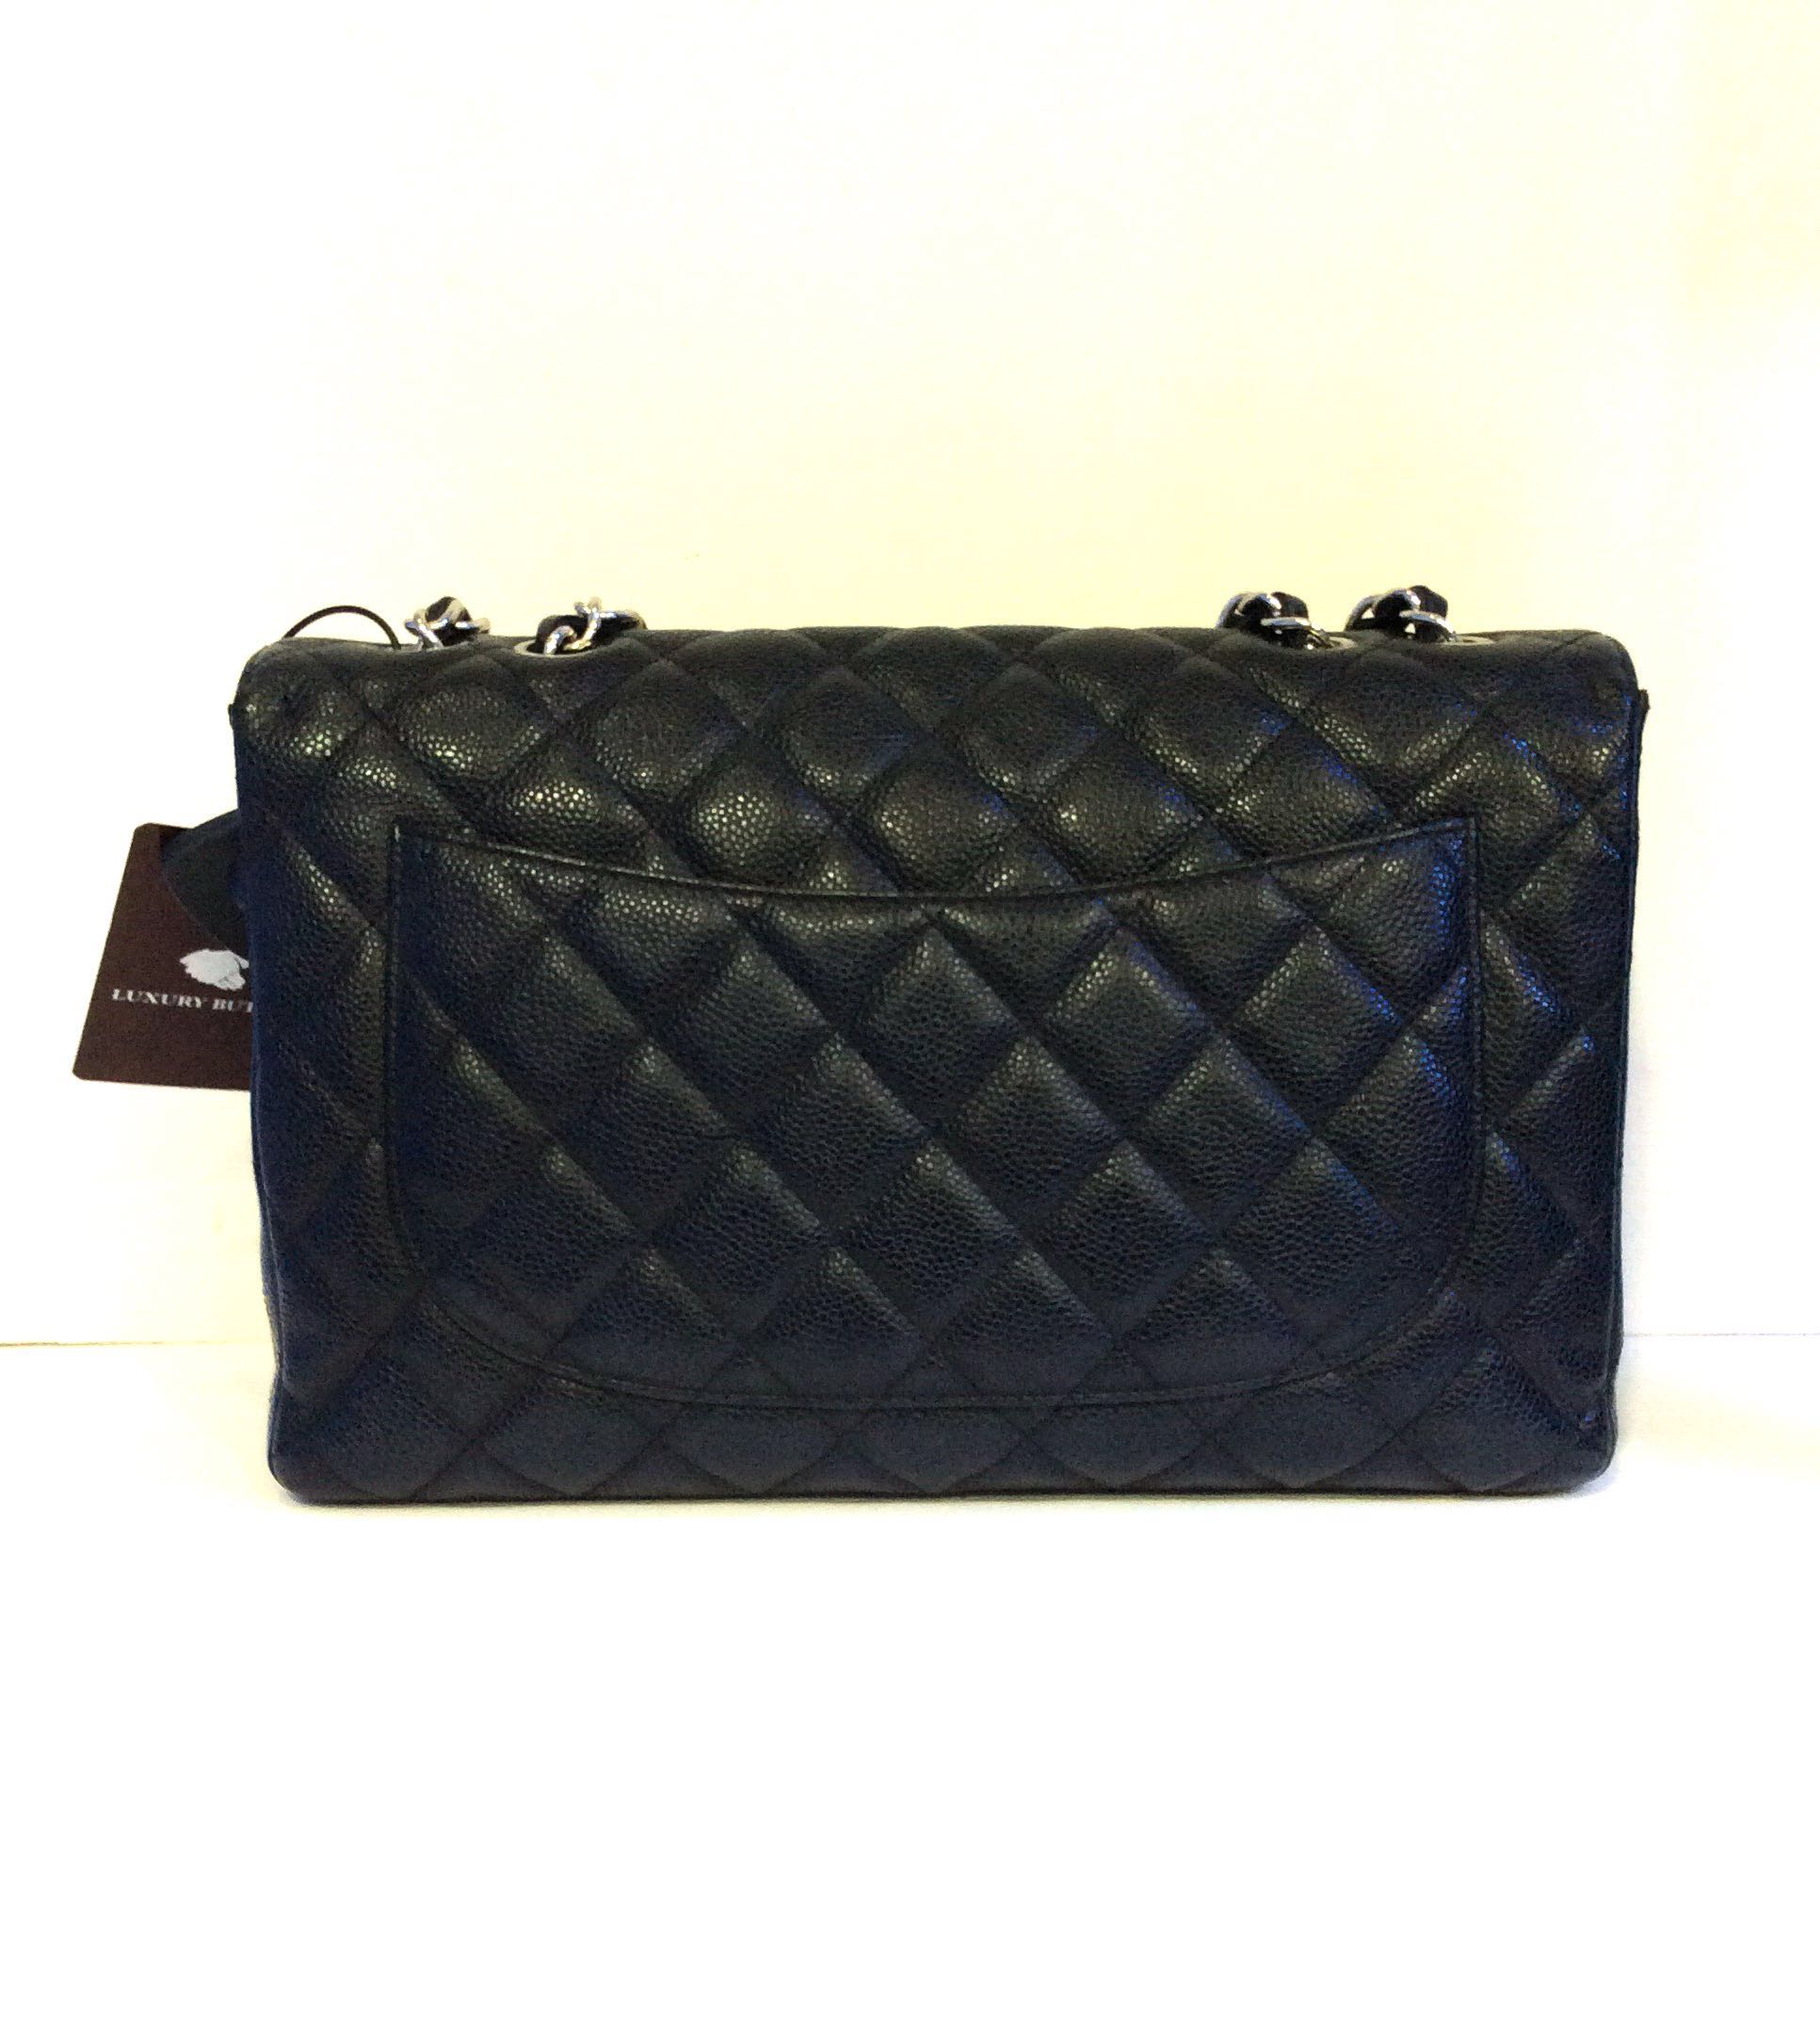 0f9b8d80dafe Preloved Chanel Classic Flap Caviar Leather Bag, Women's Fashion ...